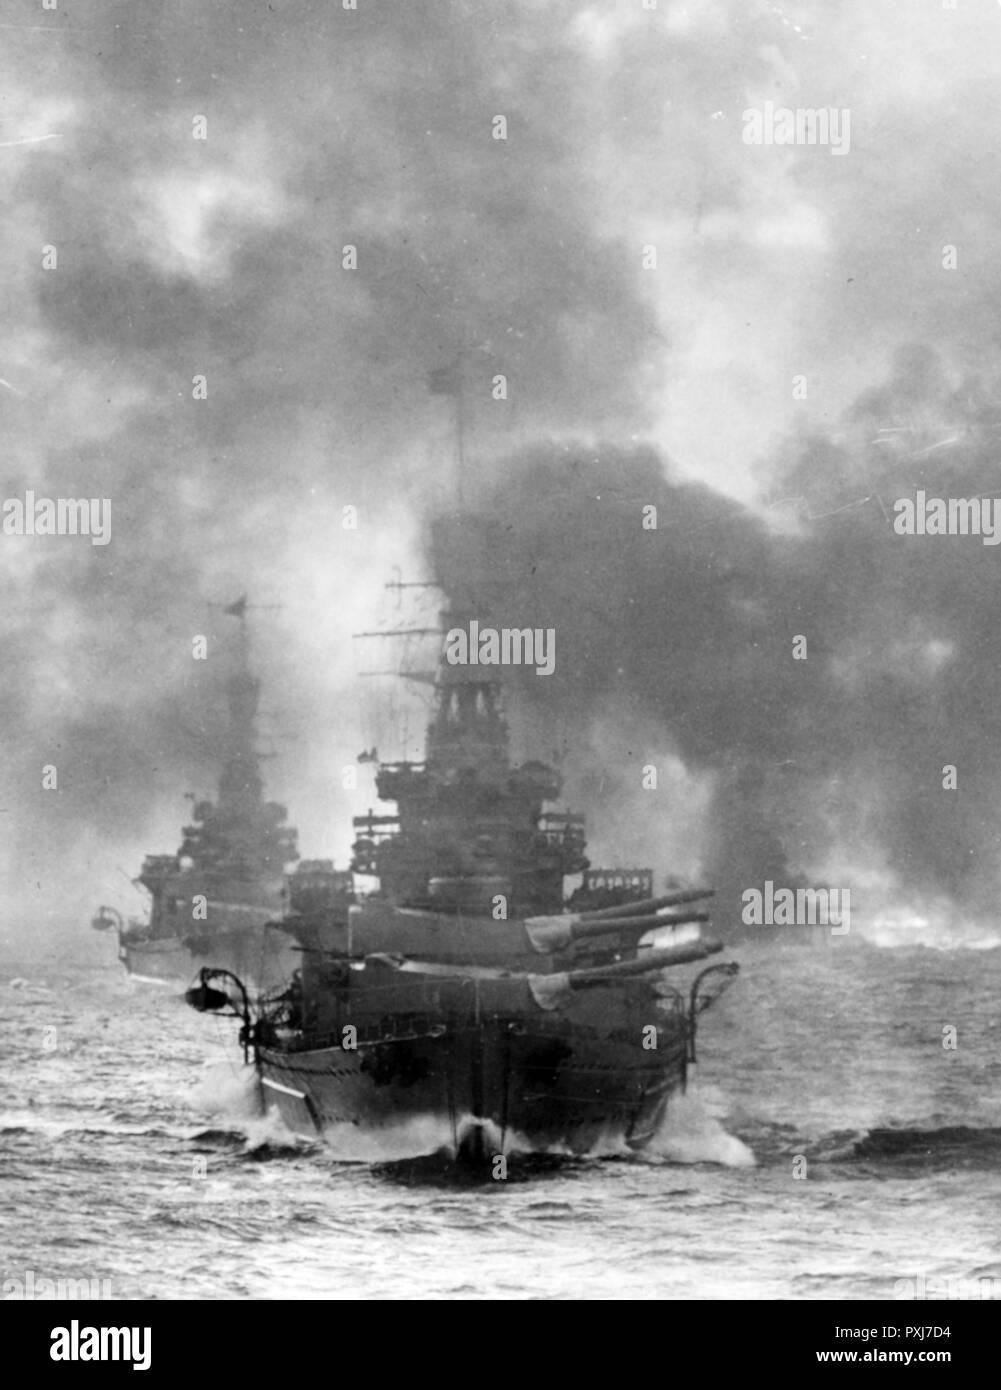 HMS Repulse, British Battlecruiser, 1916-1941 - Stock Image